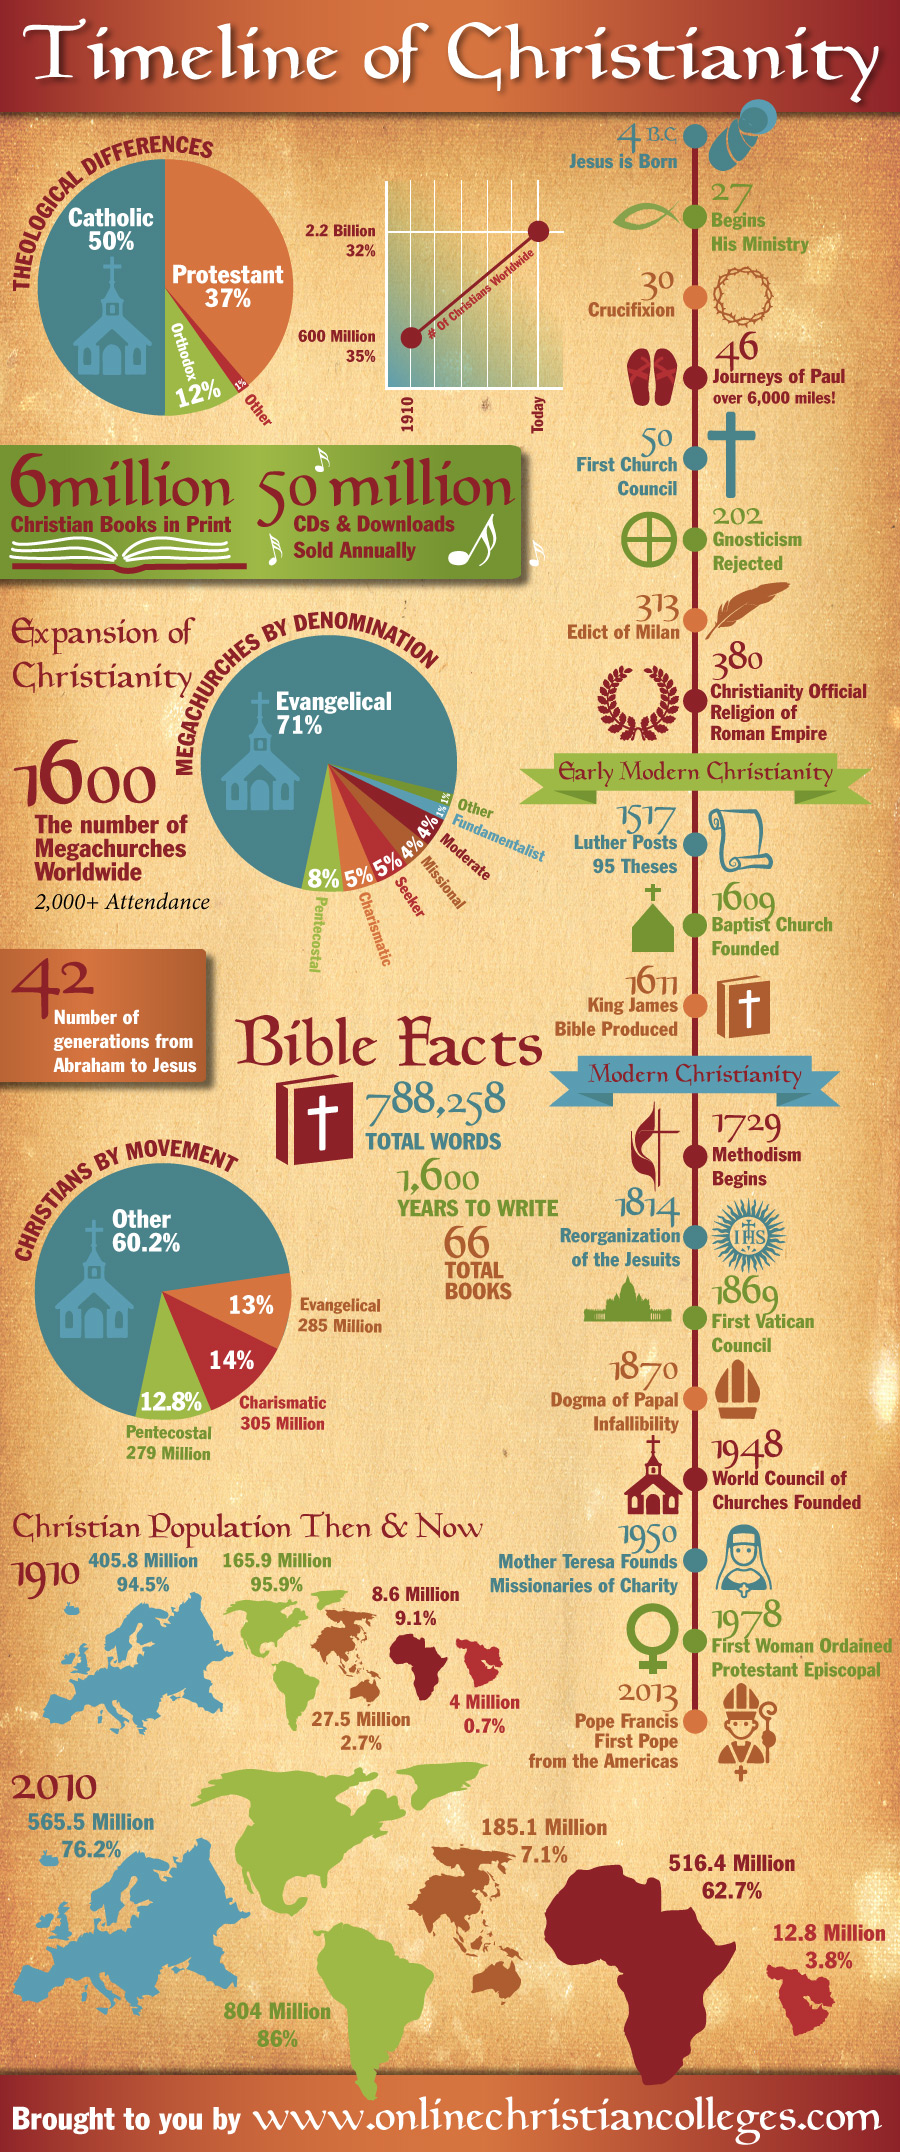 christianity-timeline